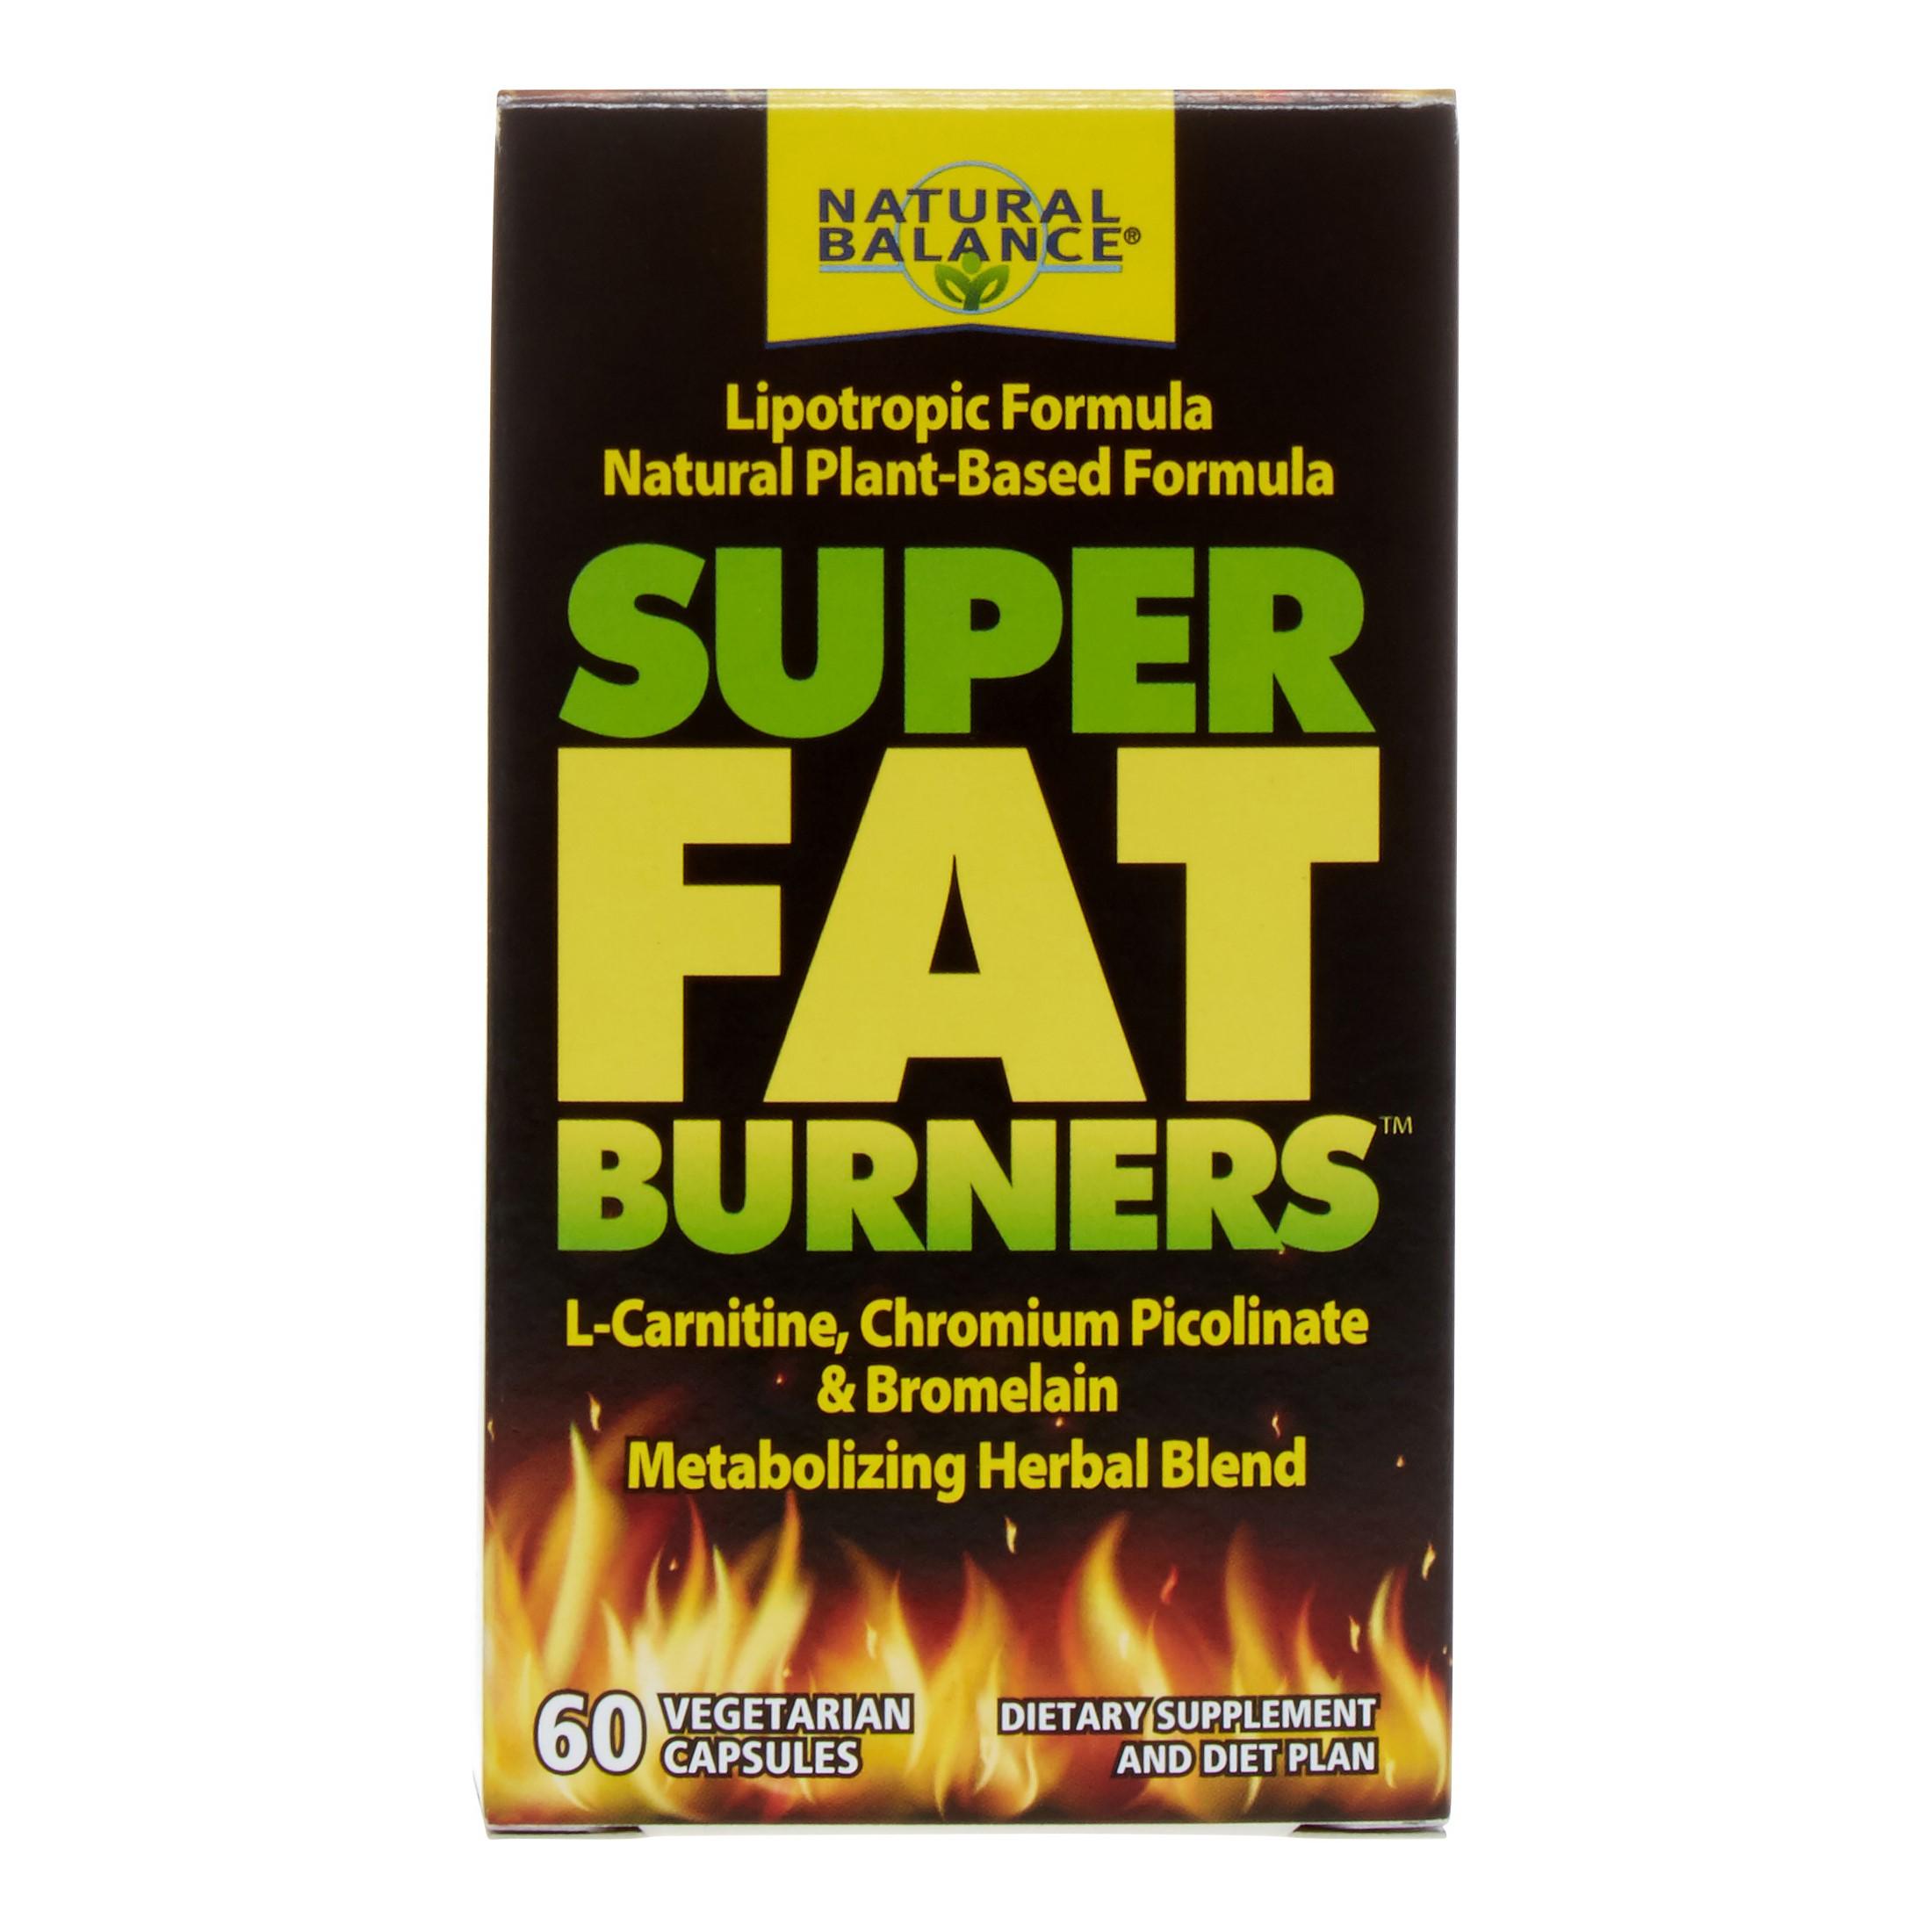 Image of Natural Balance Super Fat Burners, 60 Ct